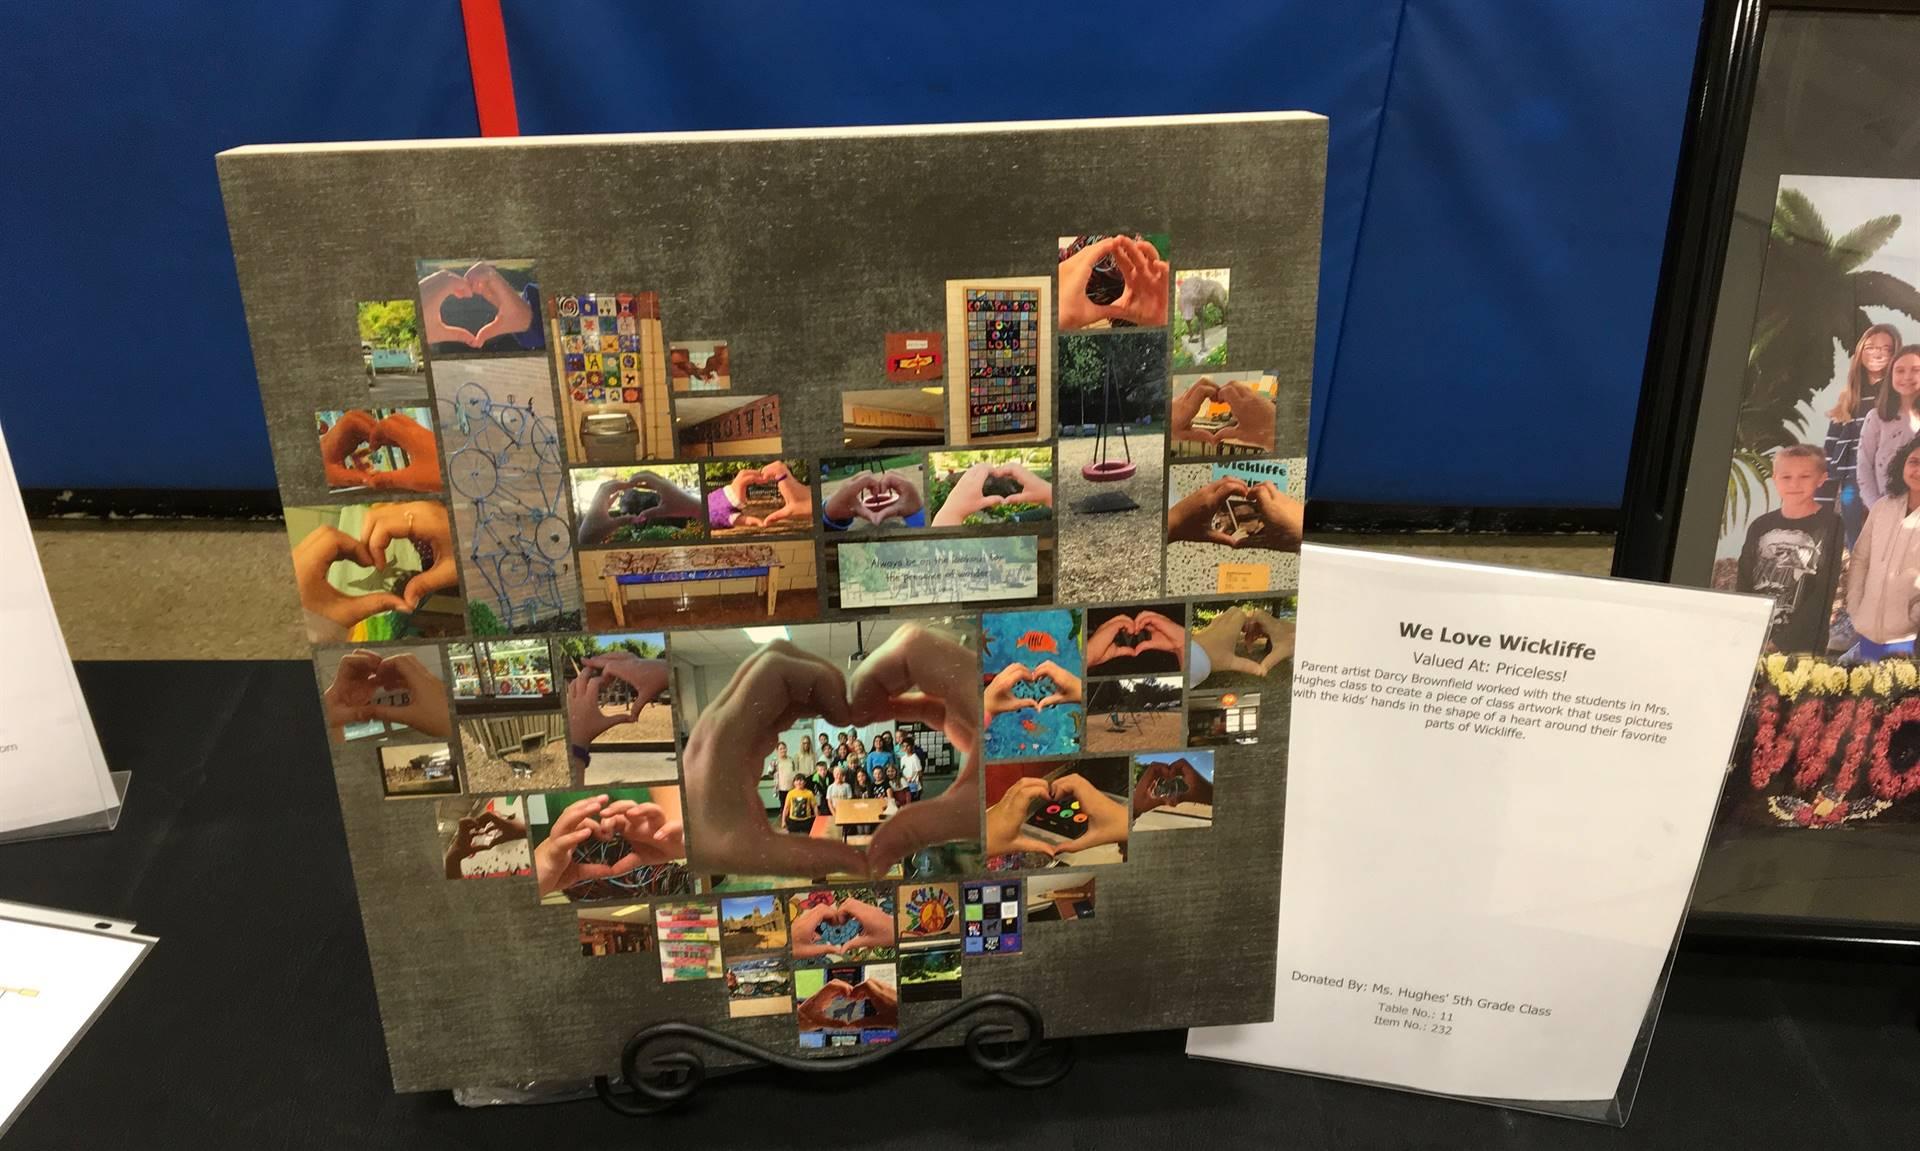 Informal Affair Art Project: We Love Wickliffe